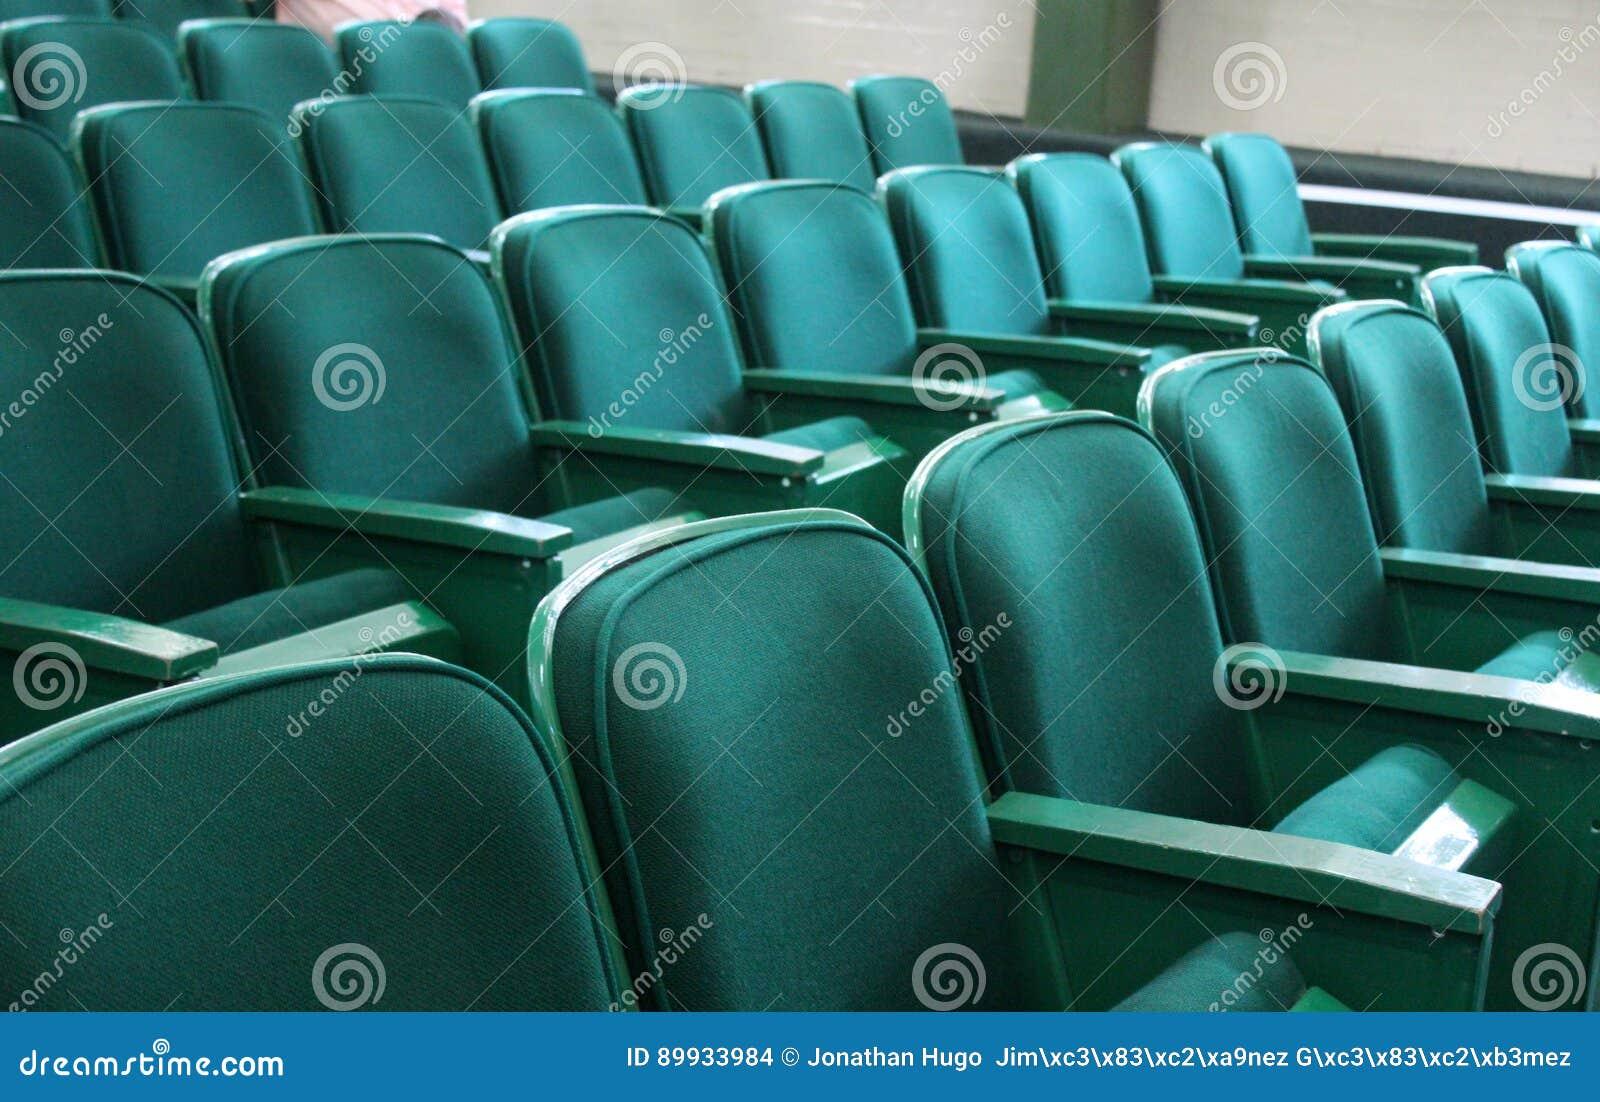 Auditory seats